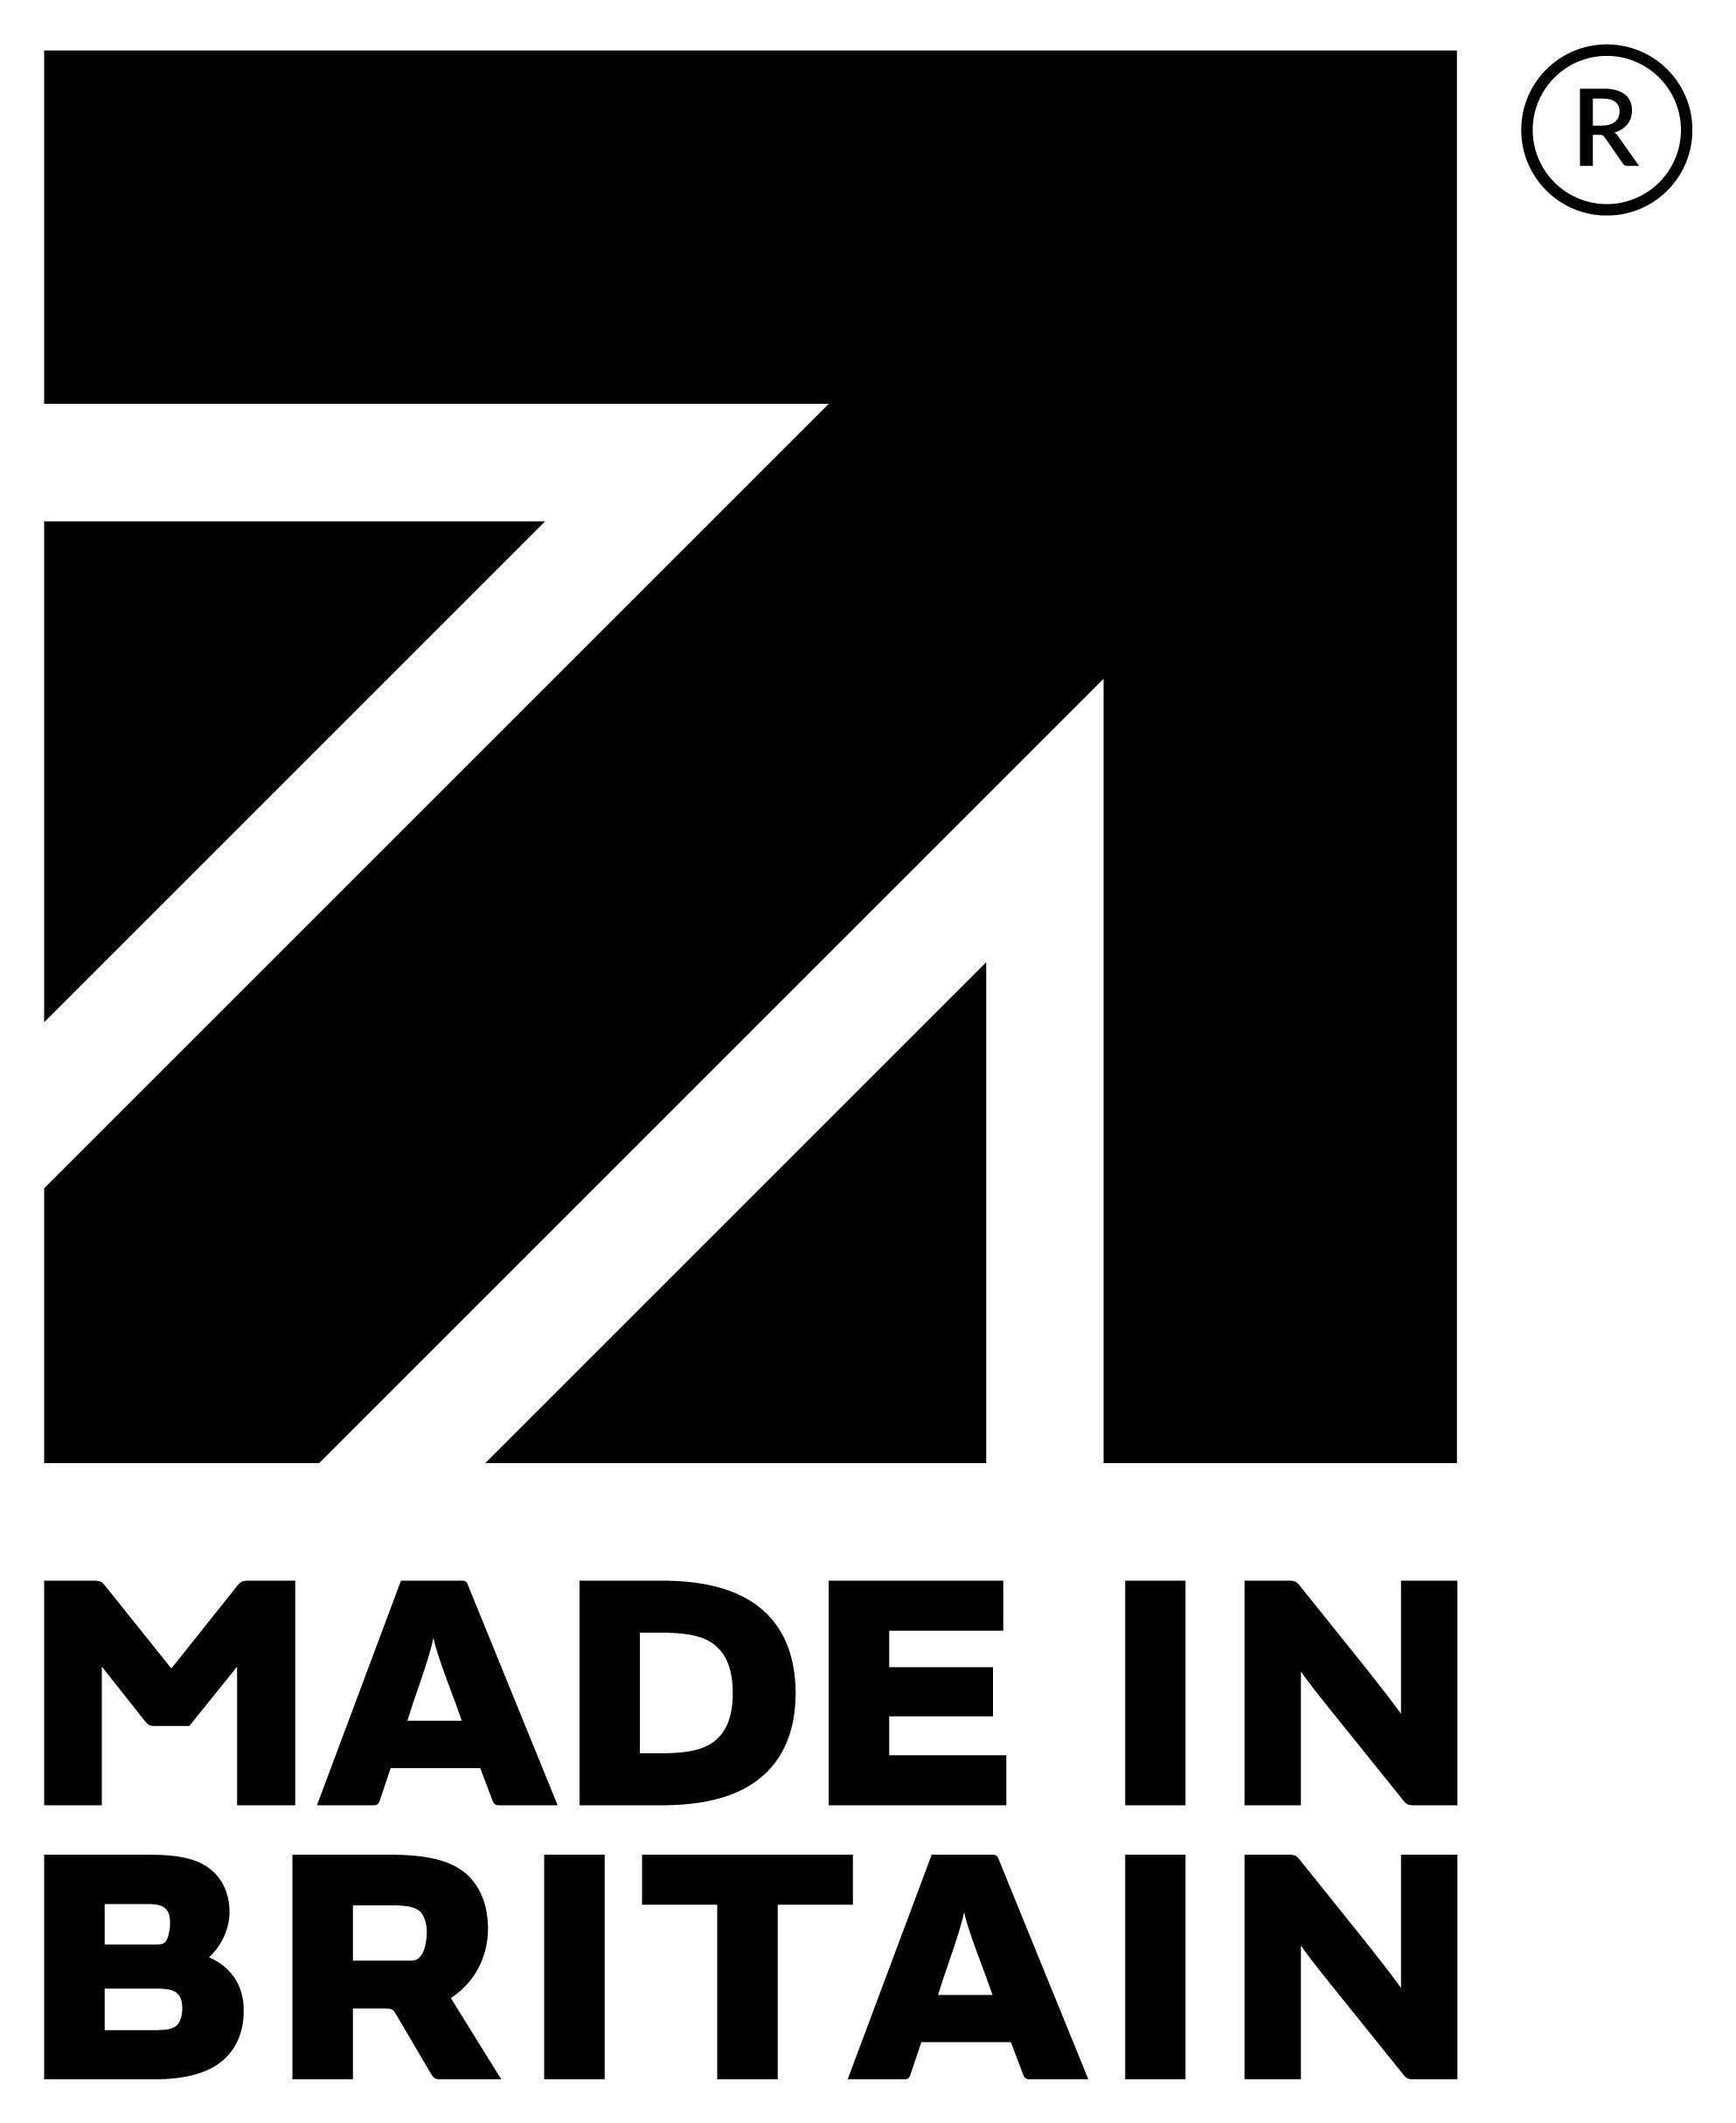 Made In Britain - JSJ UK - Bespoke Joinery